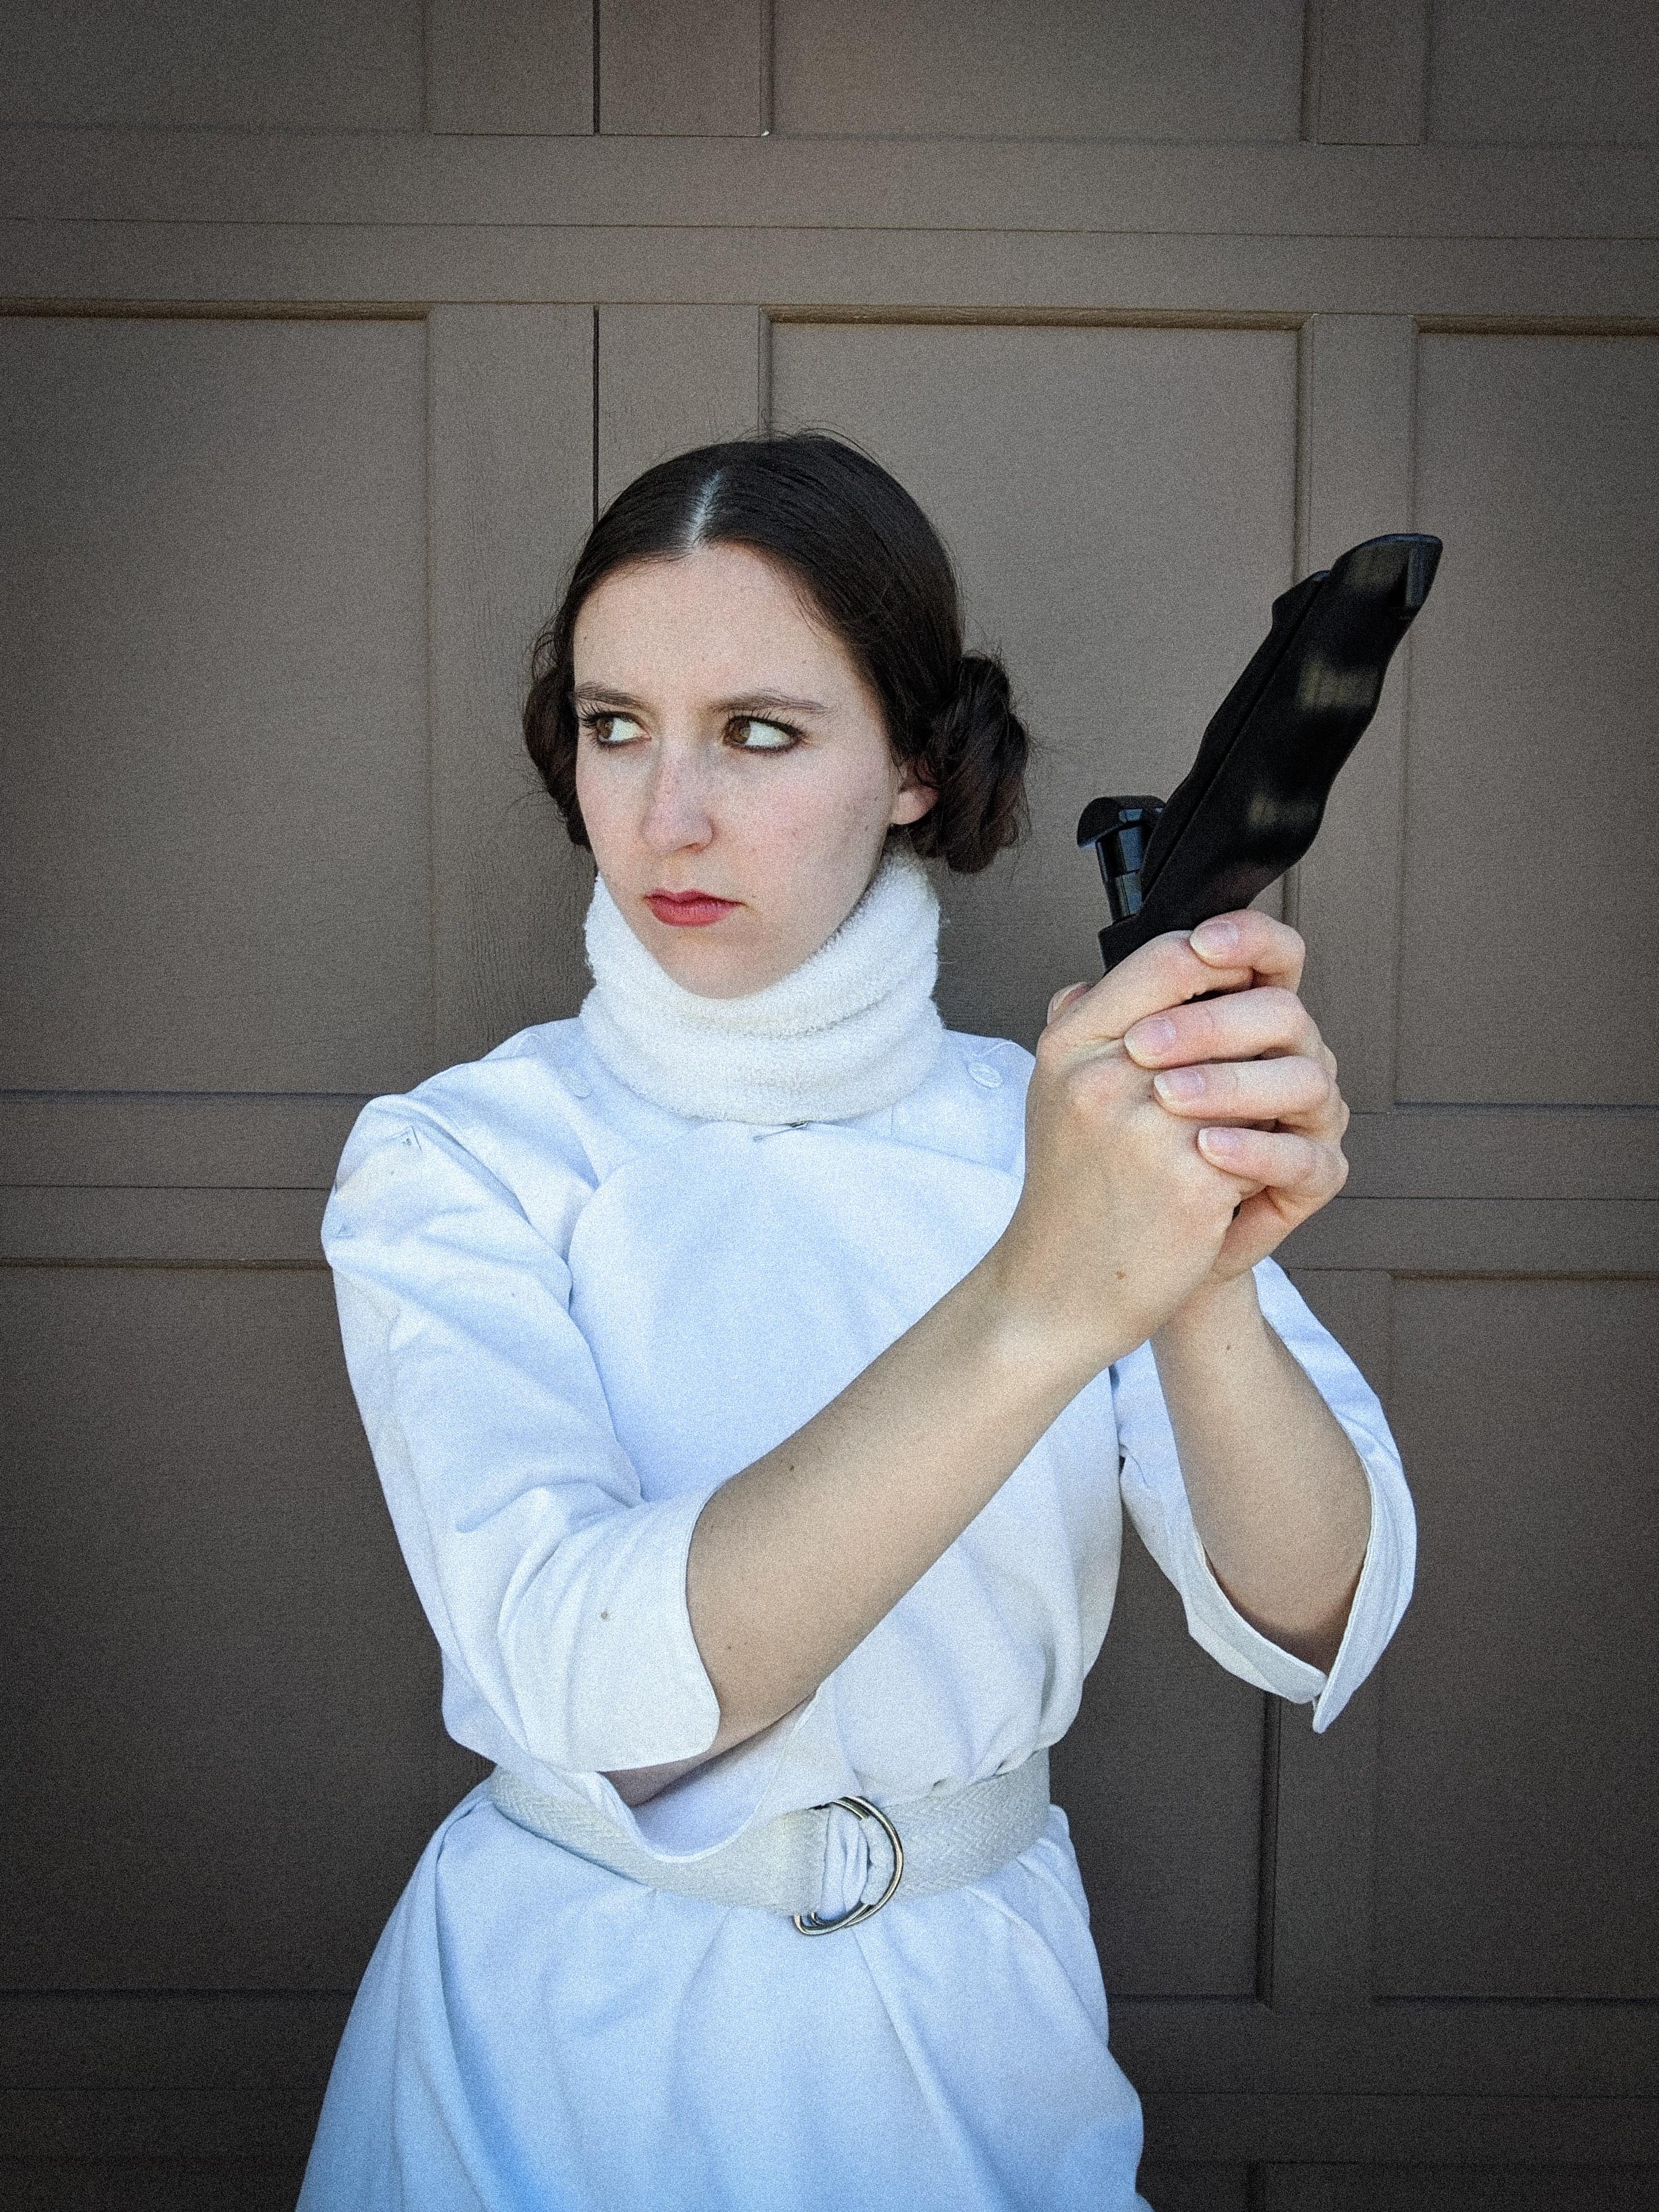 Princess Leia costume, quarantine activities, homemade costume